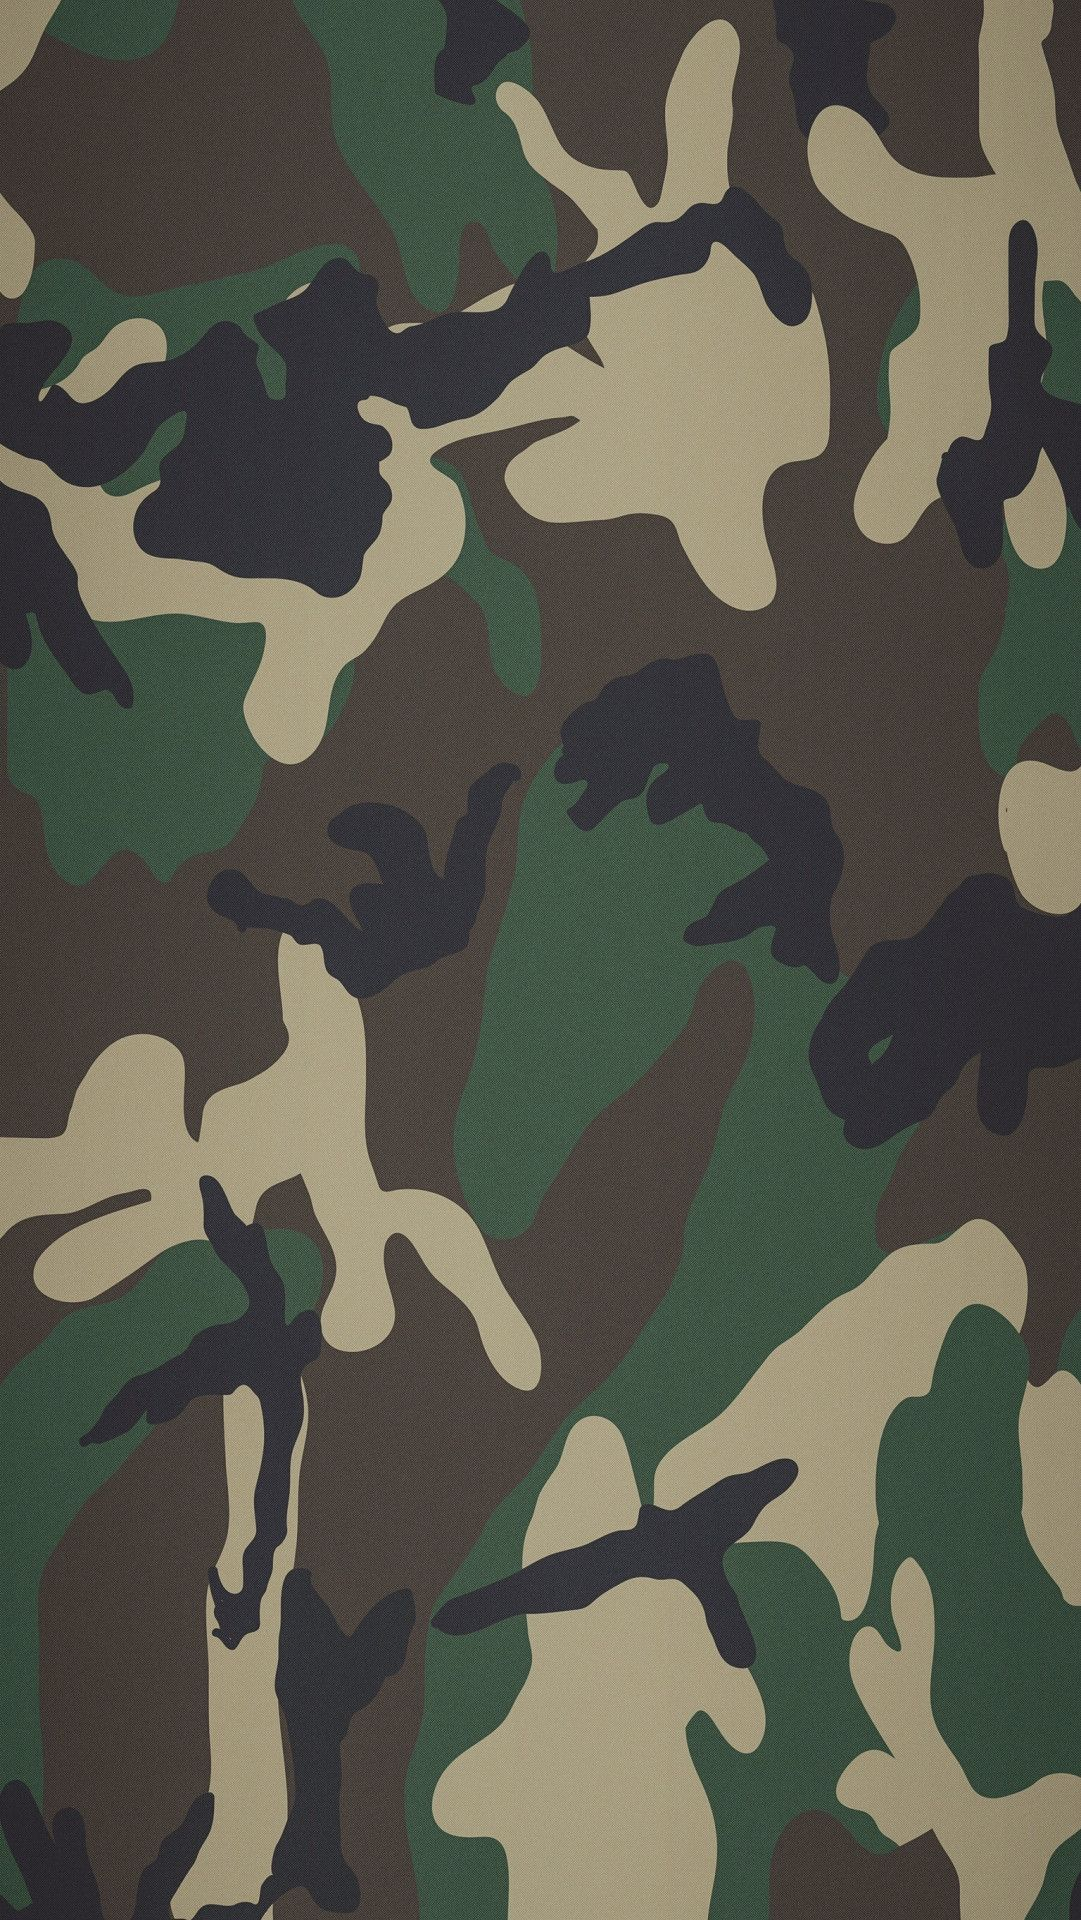 New Fond D Ecran Iphone 6s Hd Camouflage Wallpaper Camo Wallpaper Iphone Background